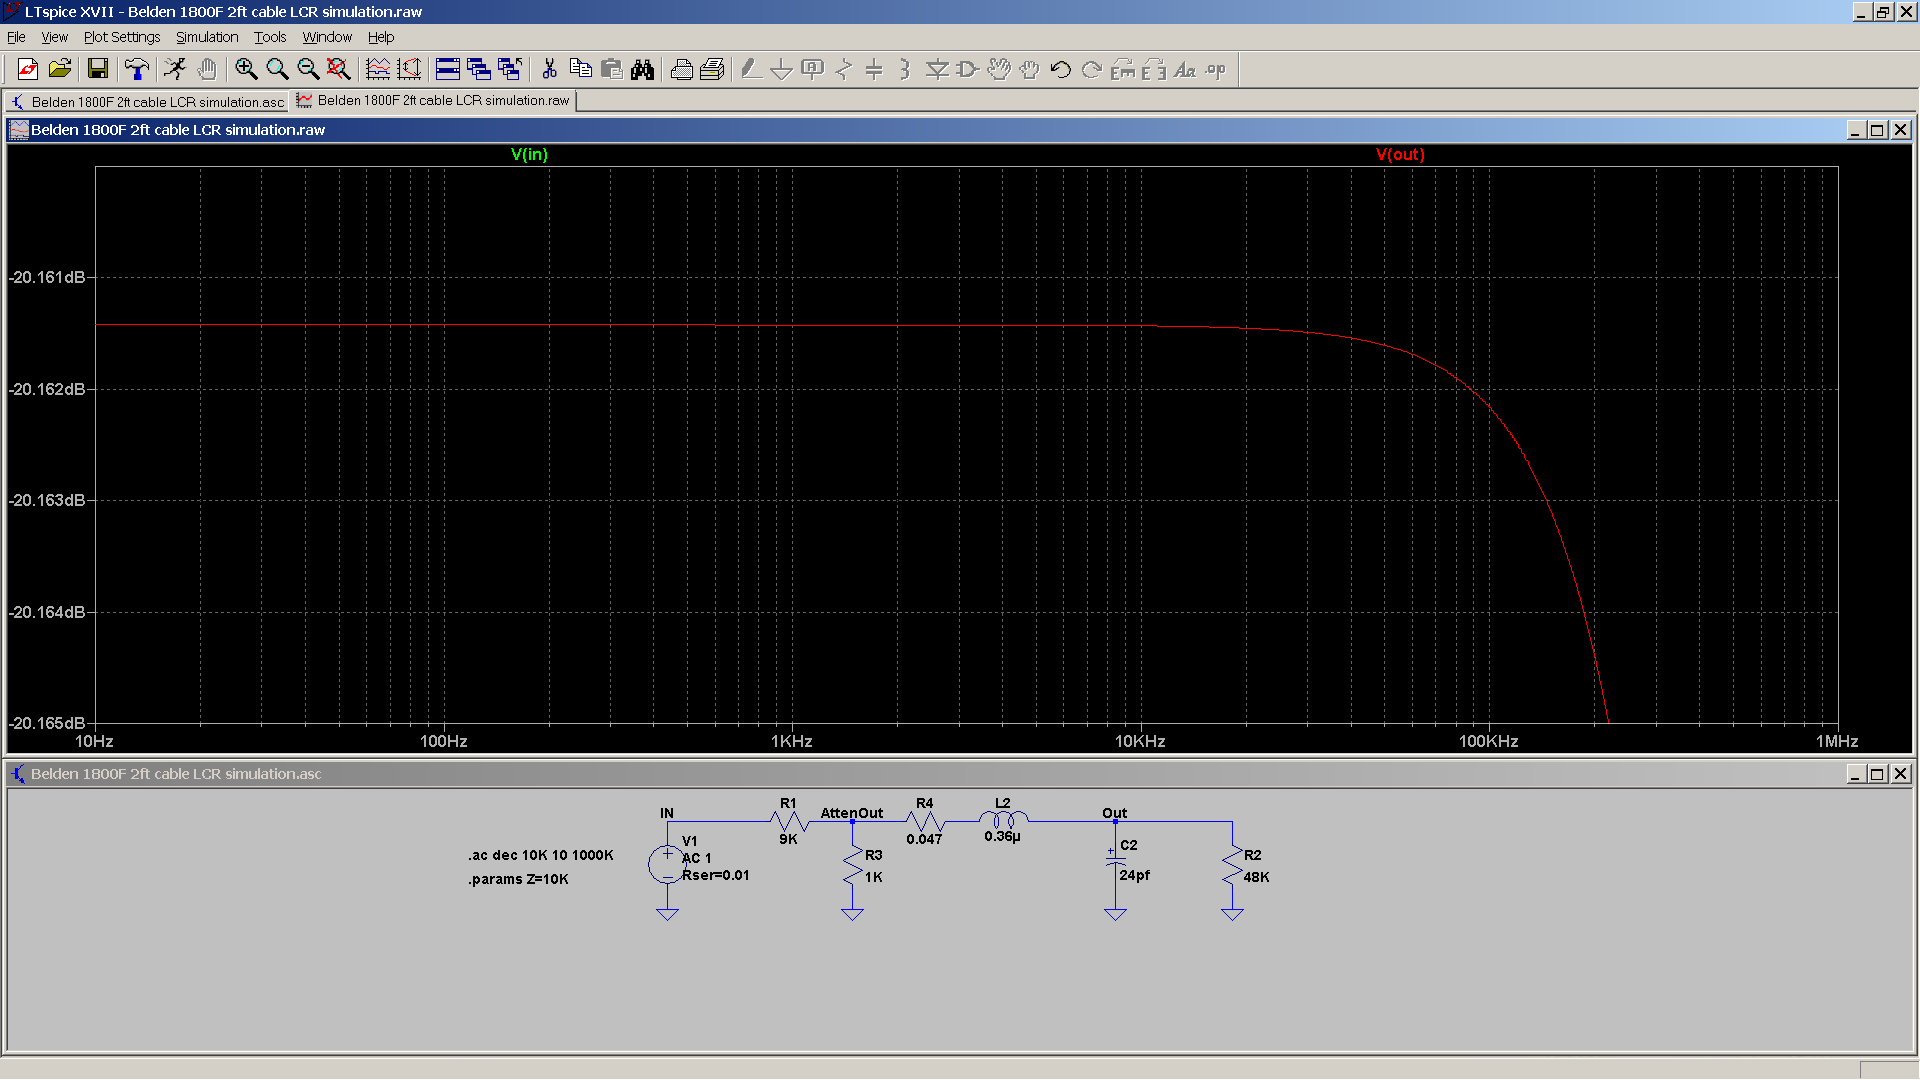 15 20190106 SA2X Belden 1800F 2ft Liquid Platinum load - 20 dB attenuation - zoom.png